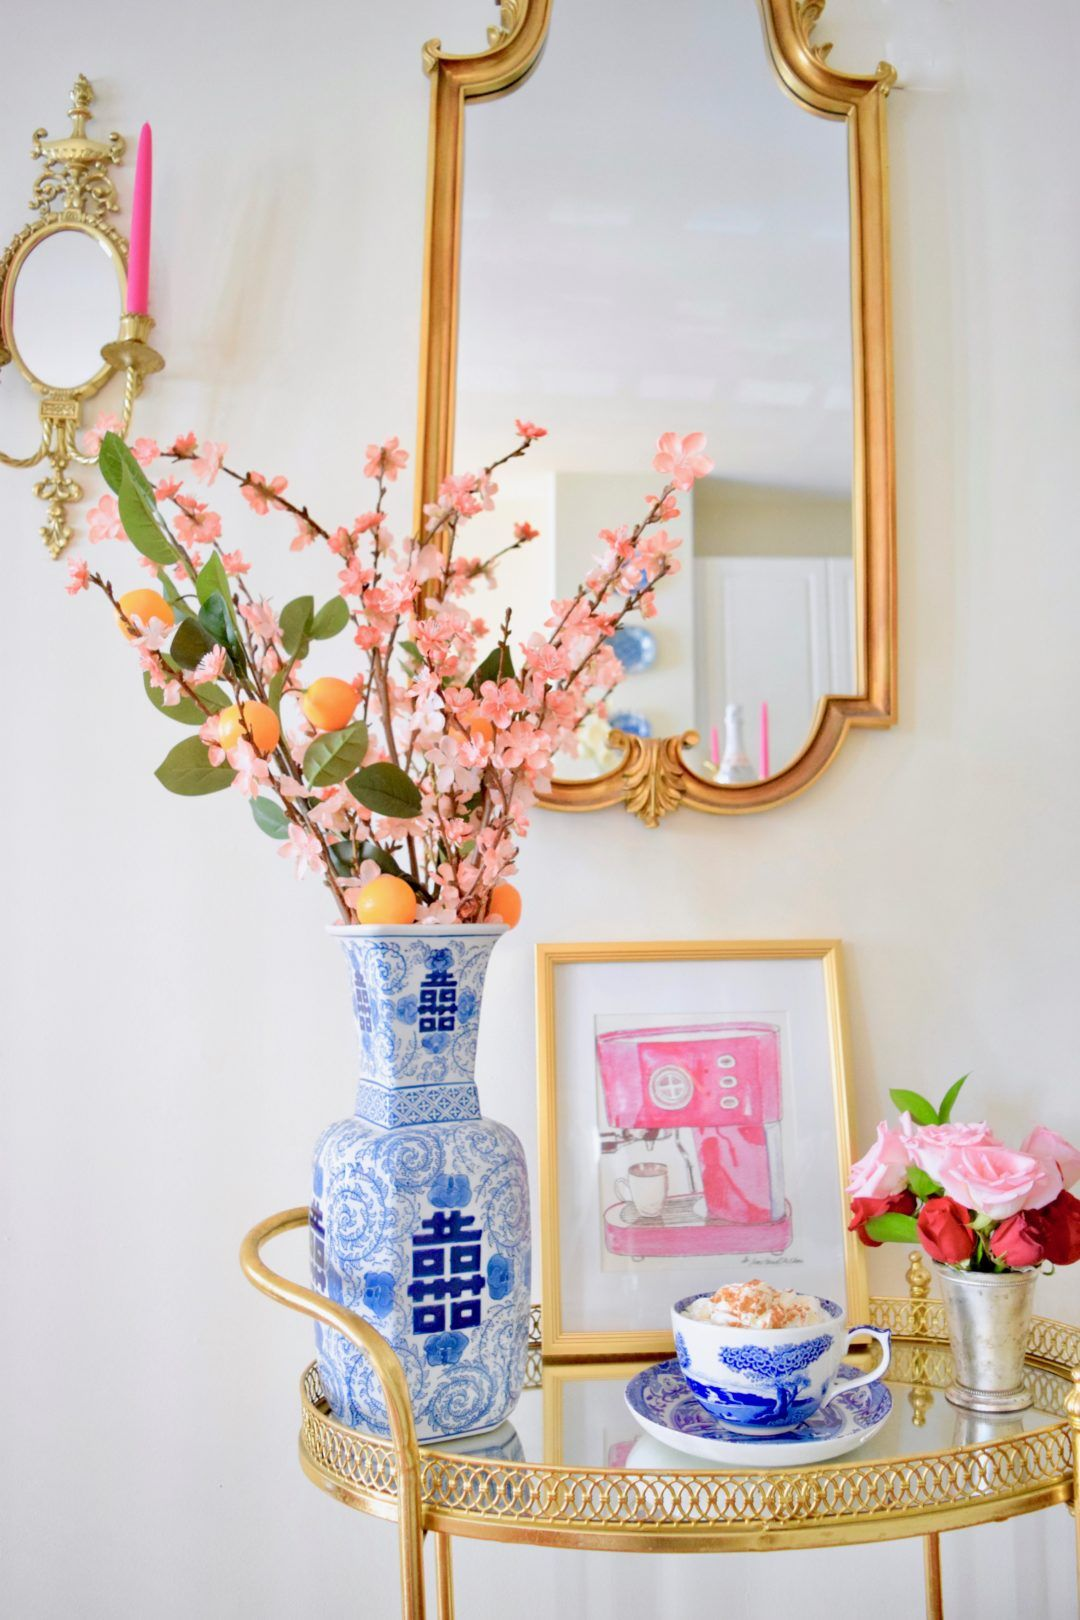 Flowers in Mint Julep Cups in 2020 Mint julep cups